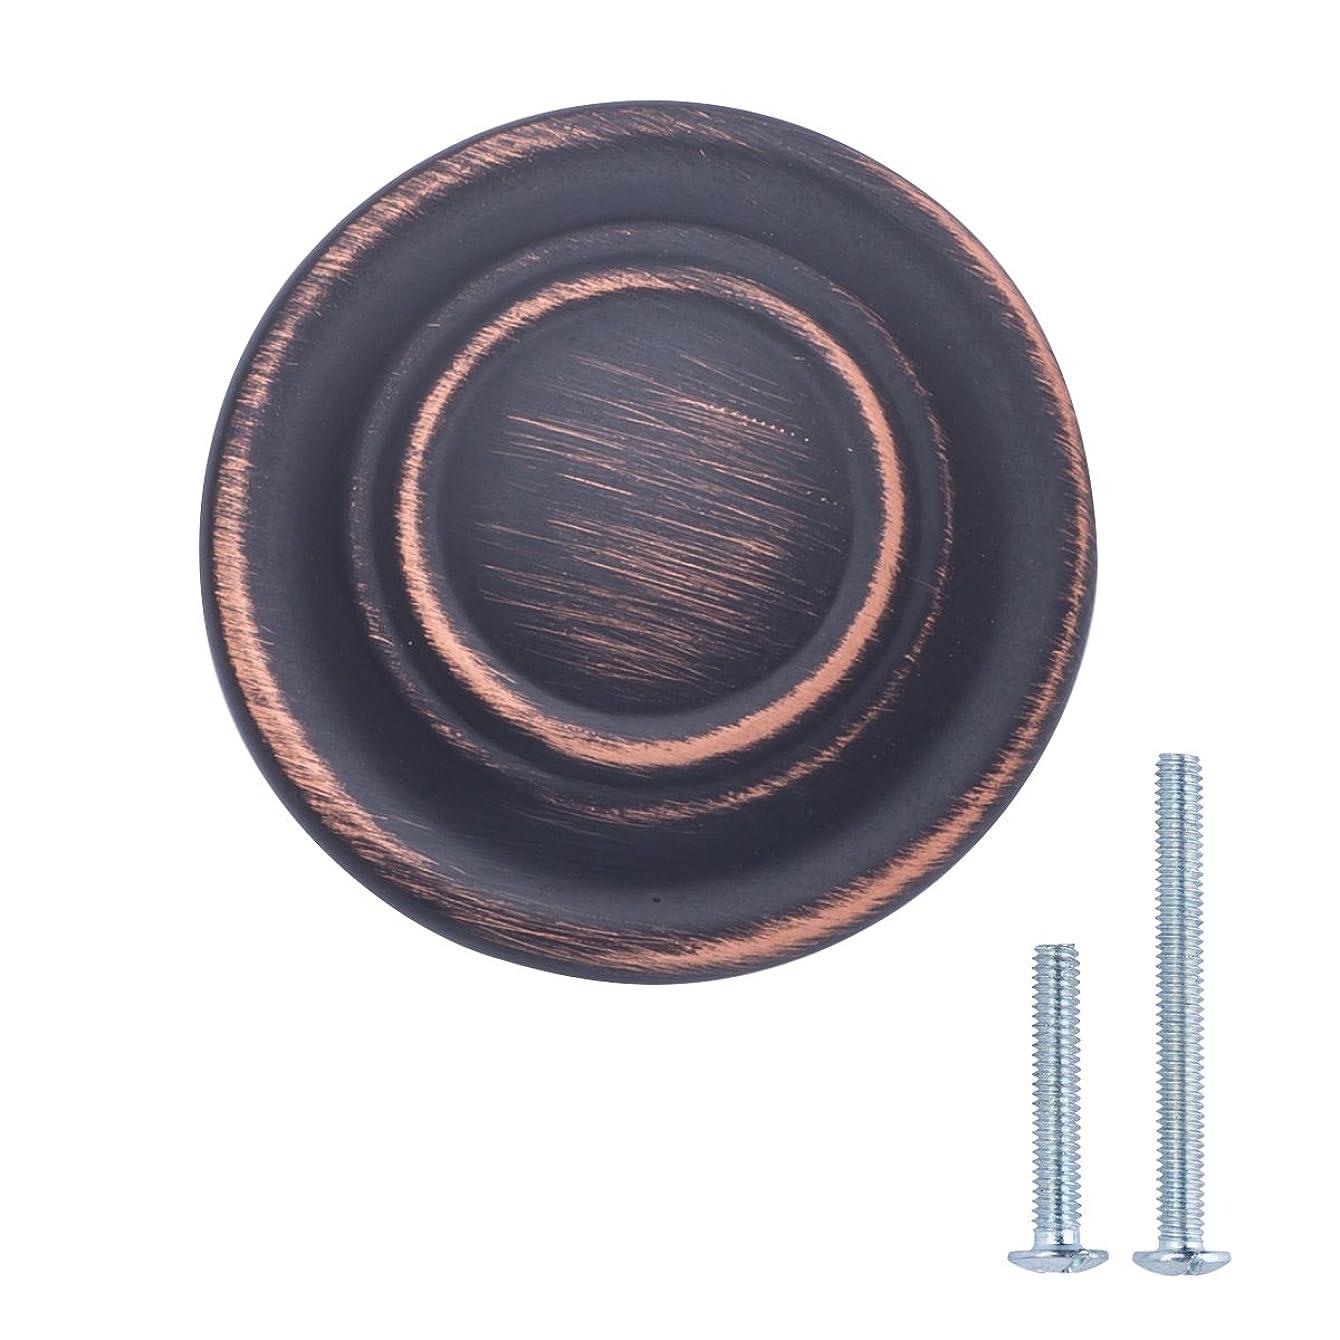 AmazonBasics Traditional Top Ring Cabinet Knob, 1.25